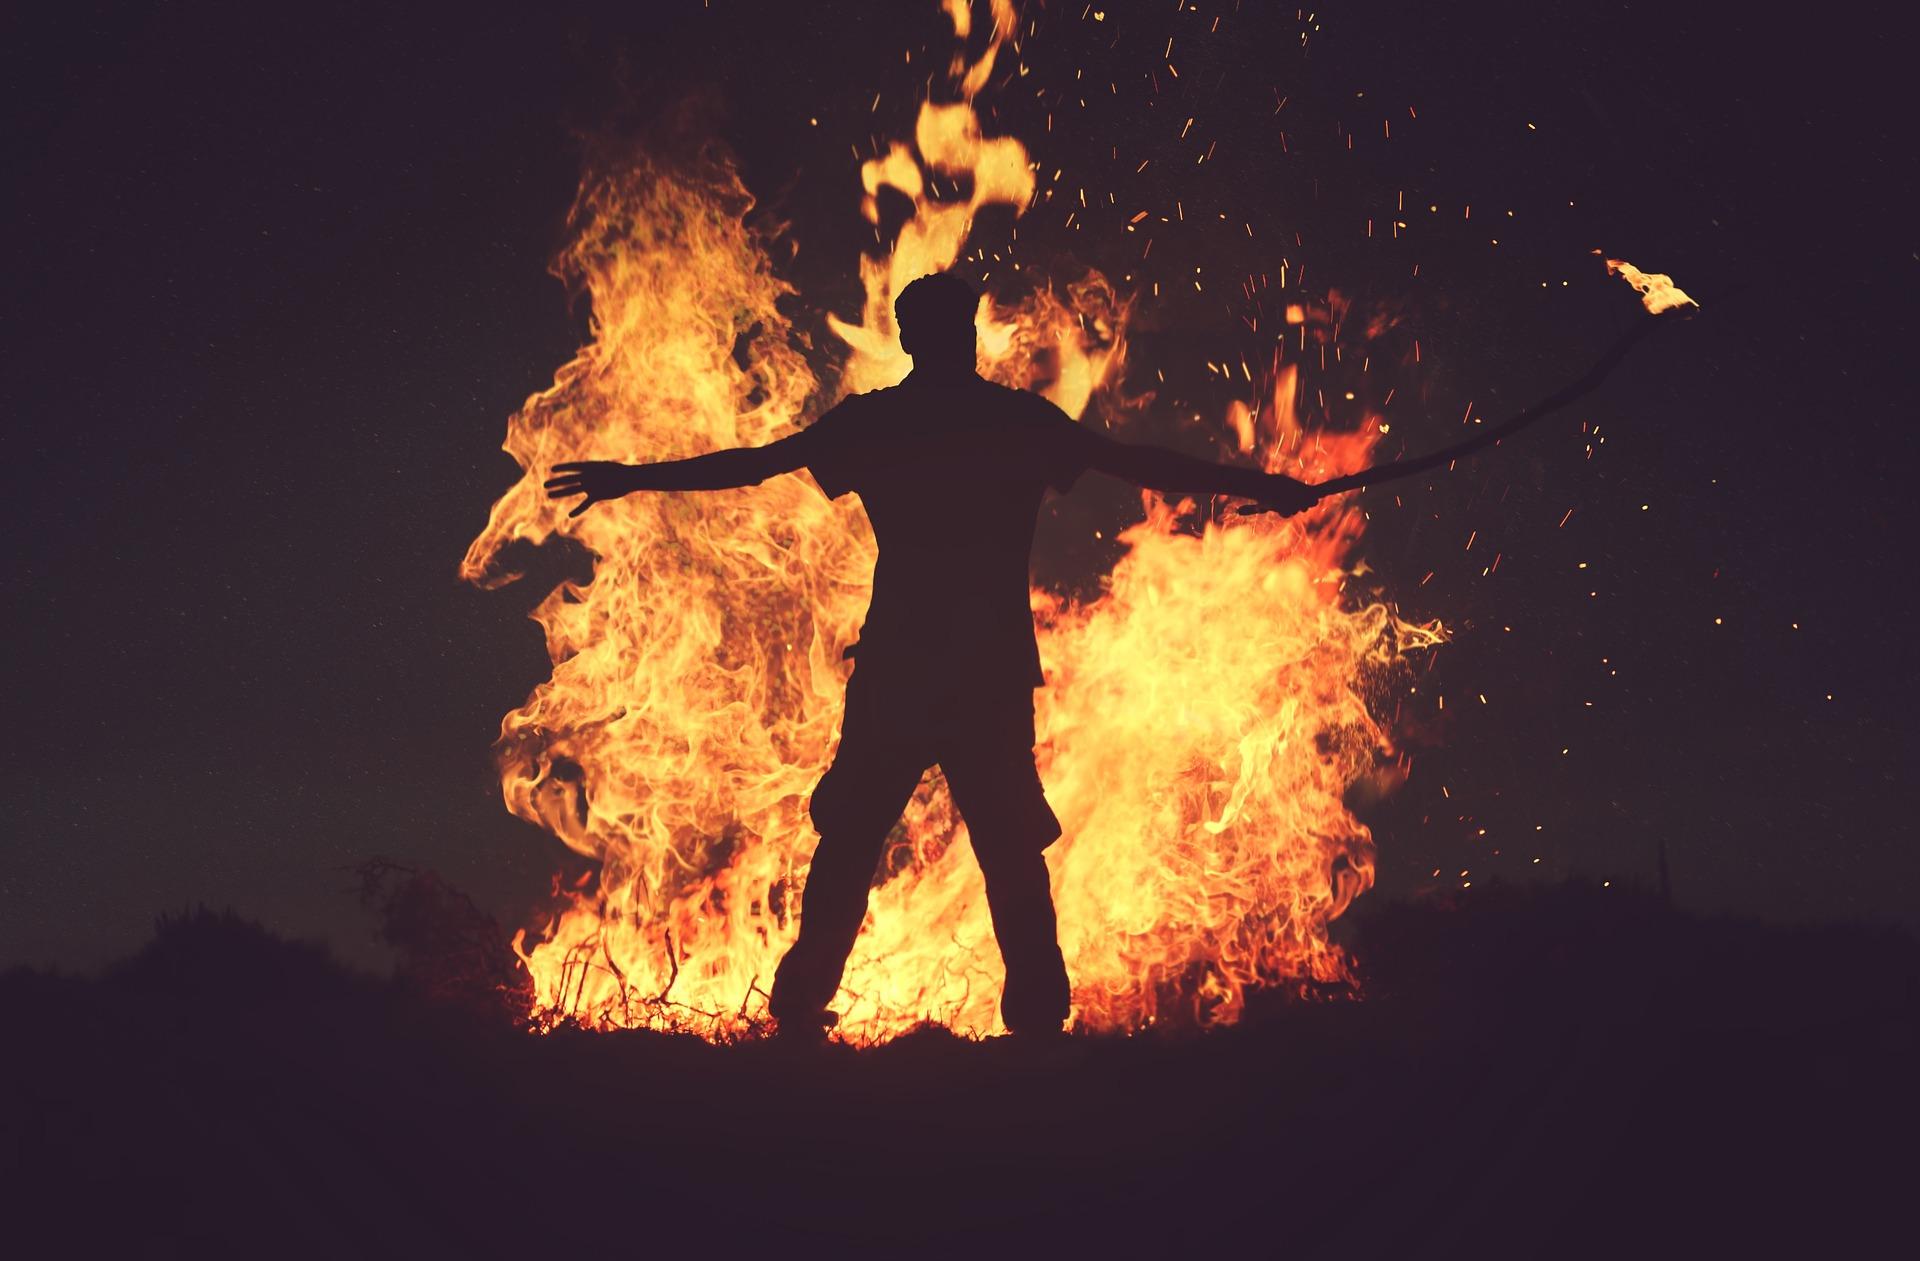 Halloween bonfire gathering